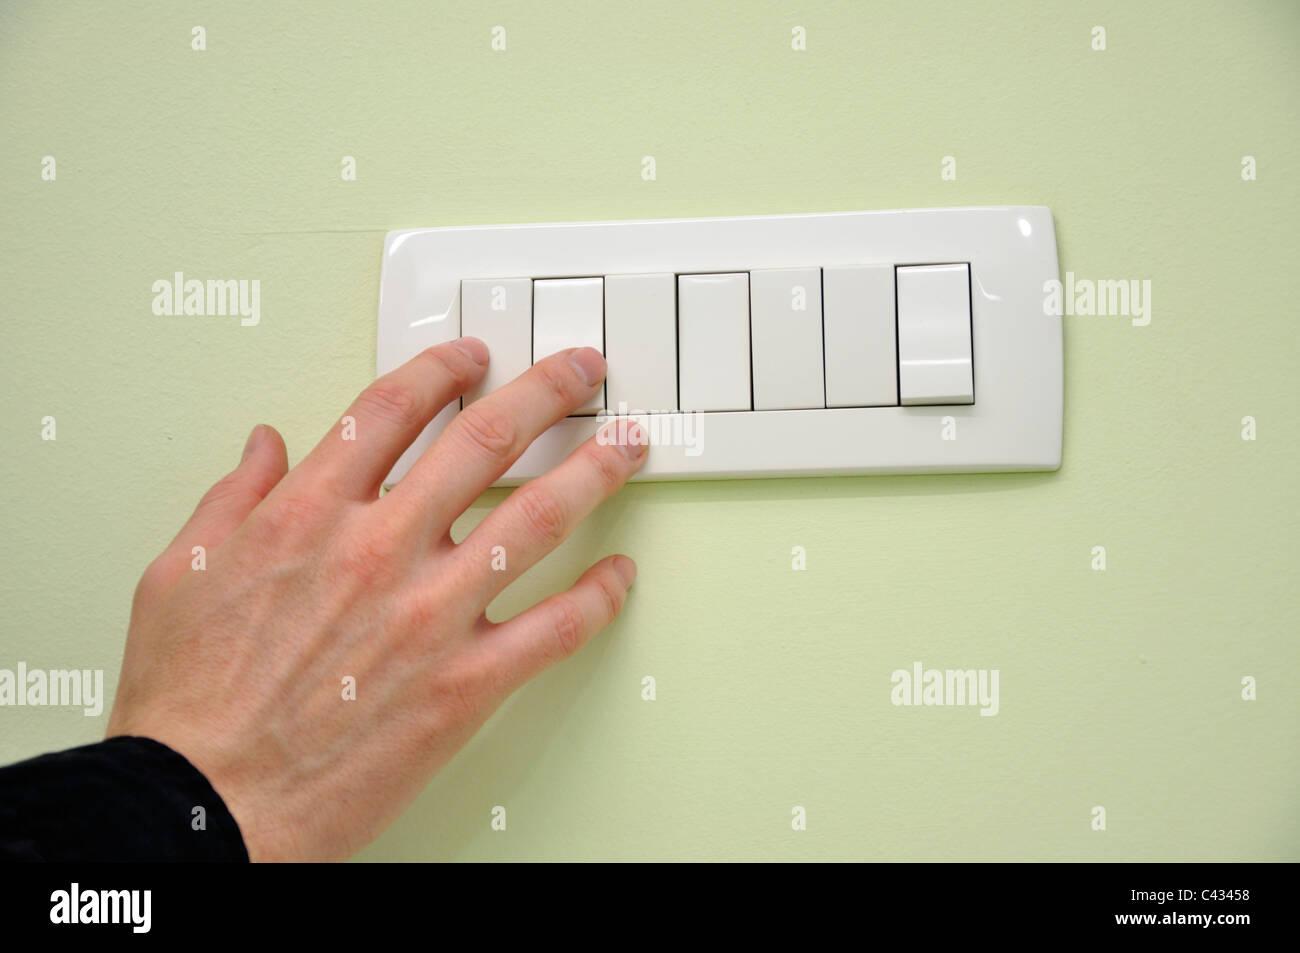 Turn Off Light Switch Stock Photos & Turn Off Light Switch Stock ...